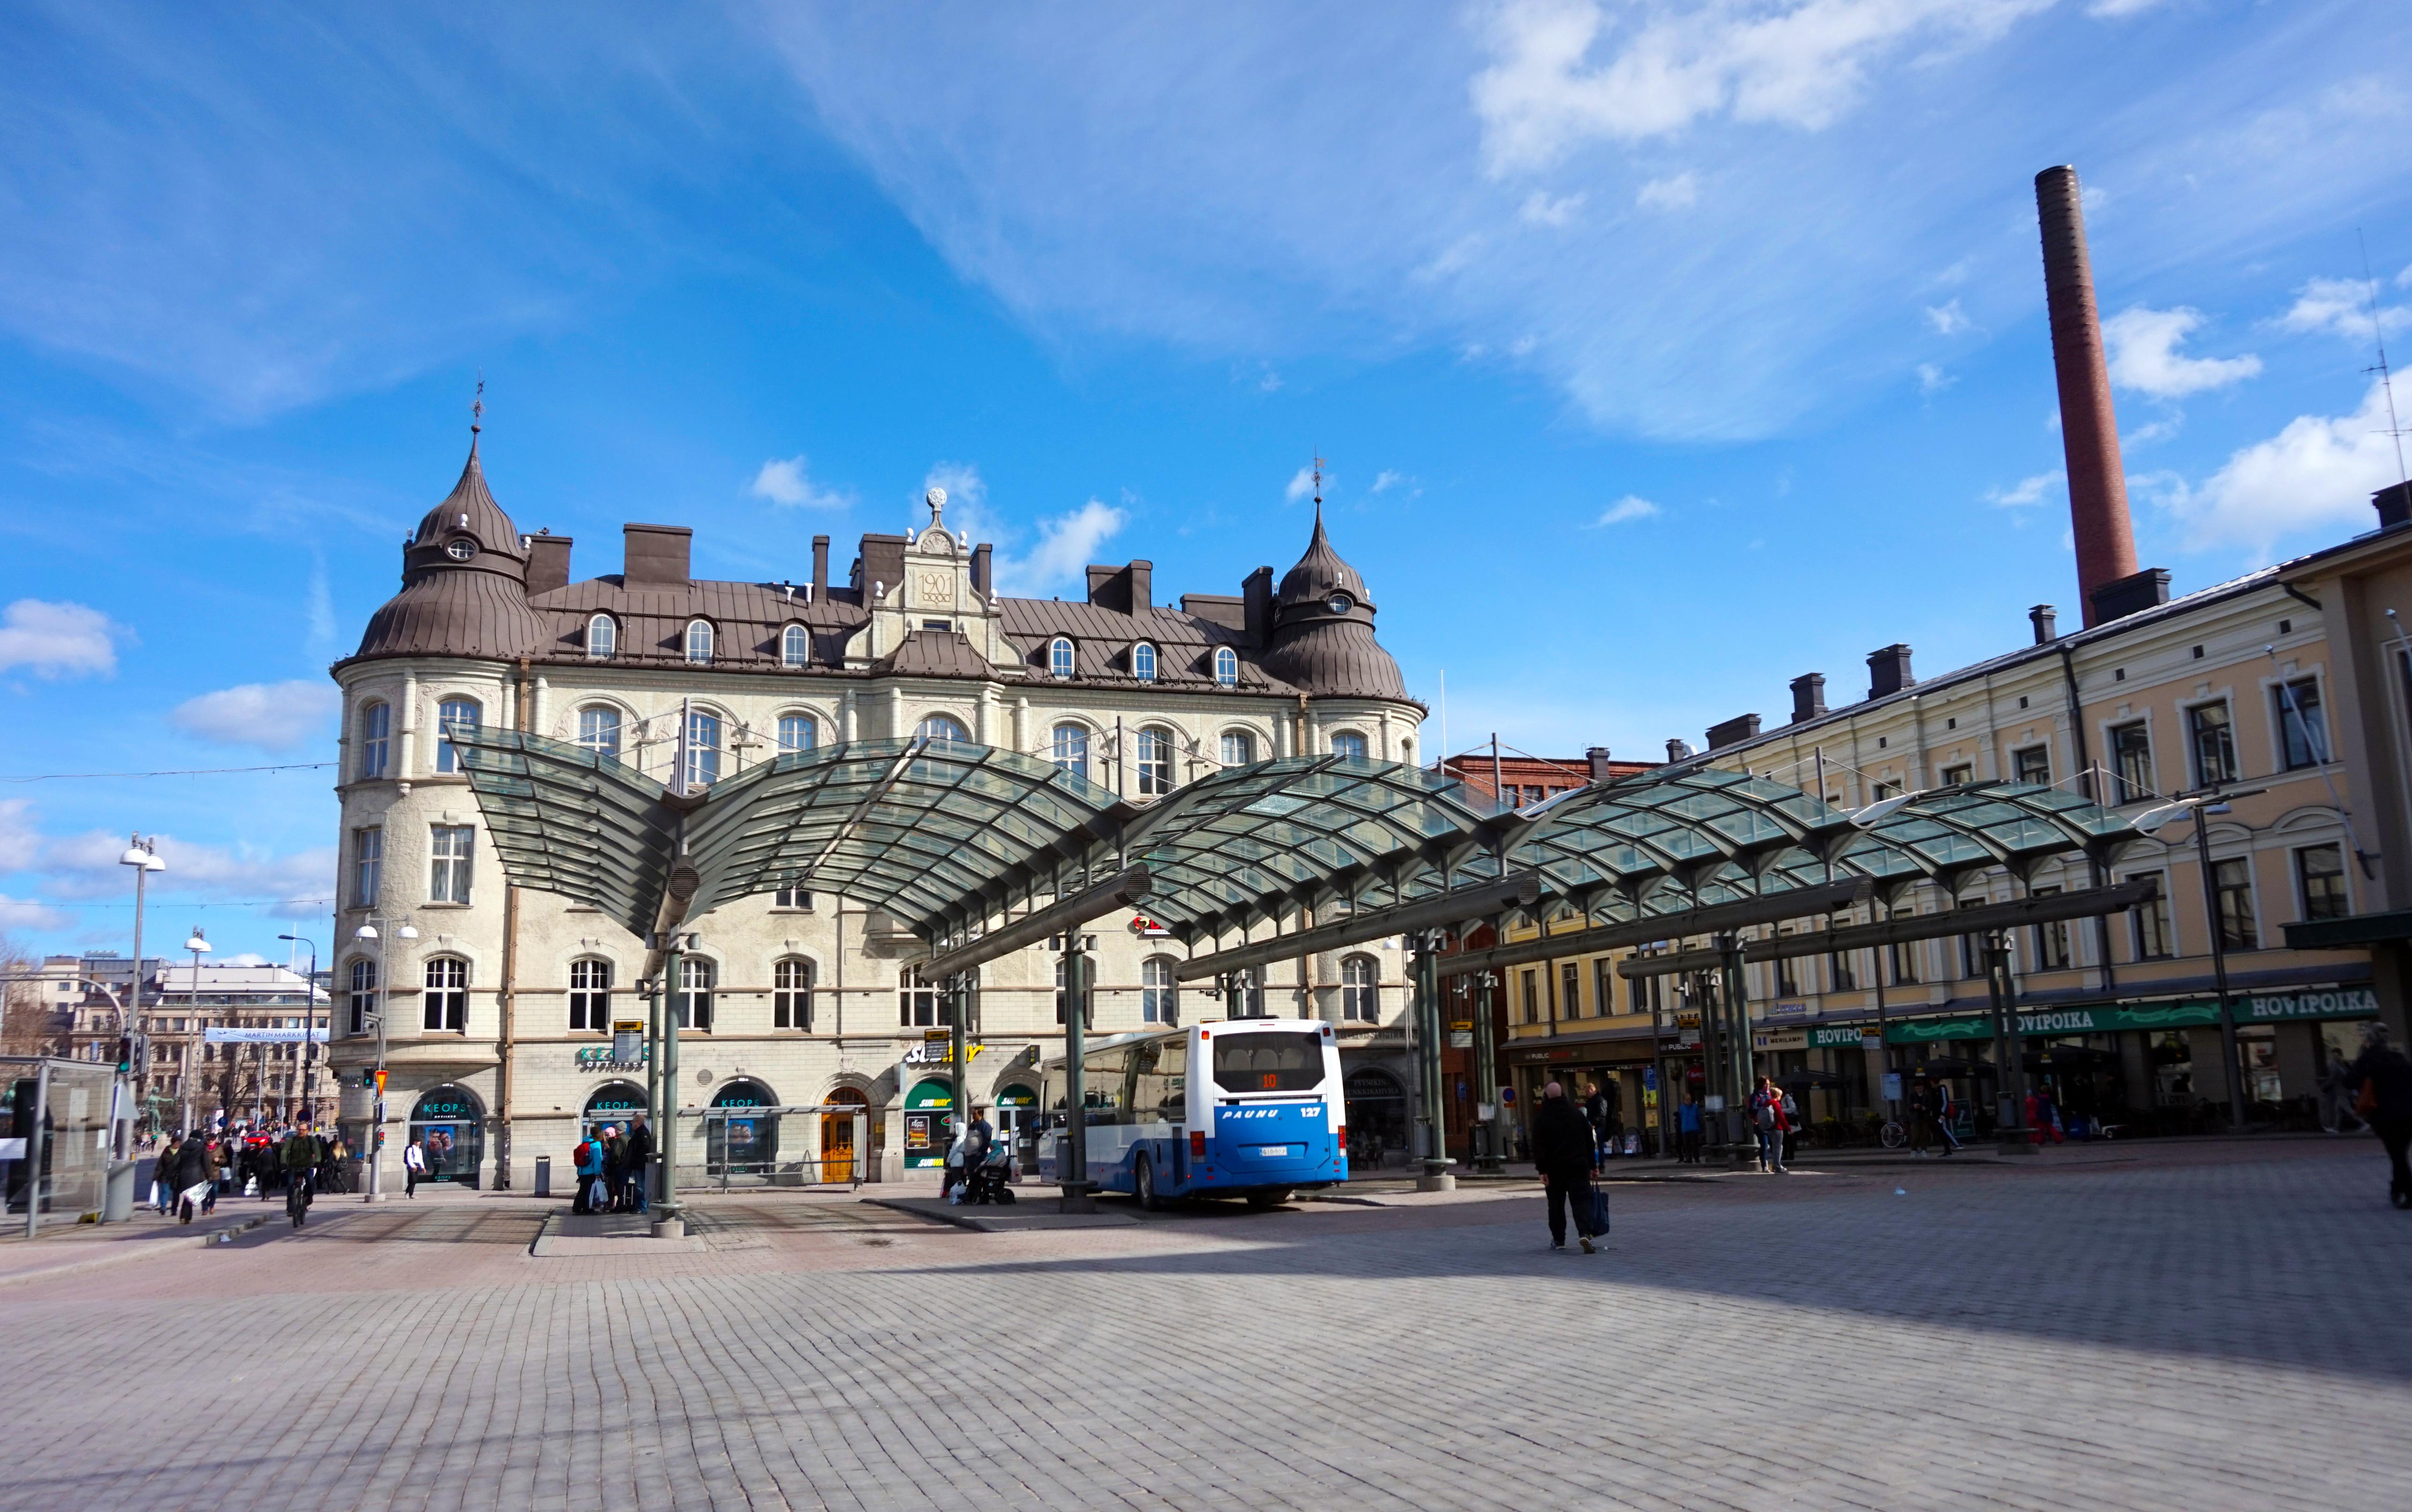 File:Tampere - Keskustori.jpg - Wikimedia Commons